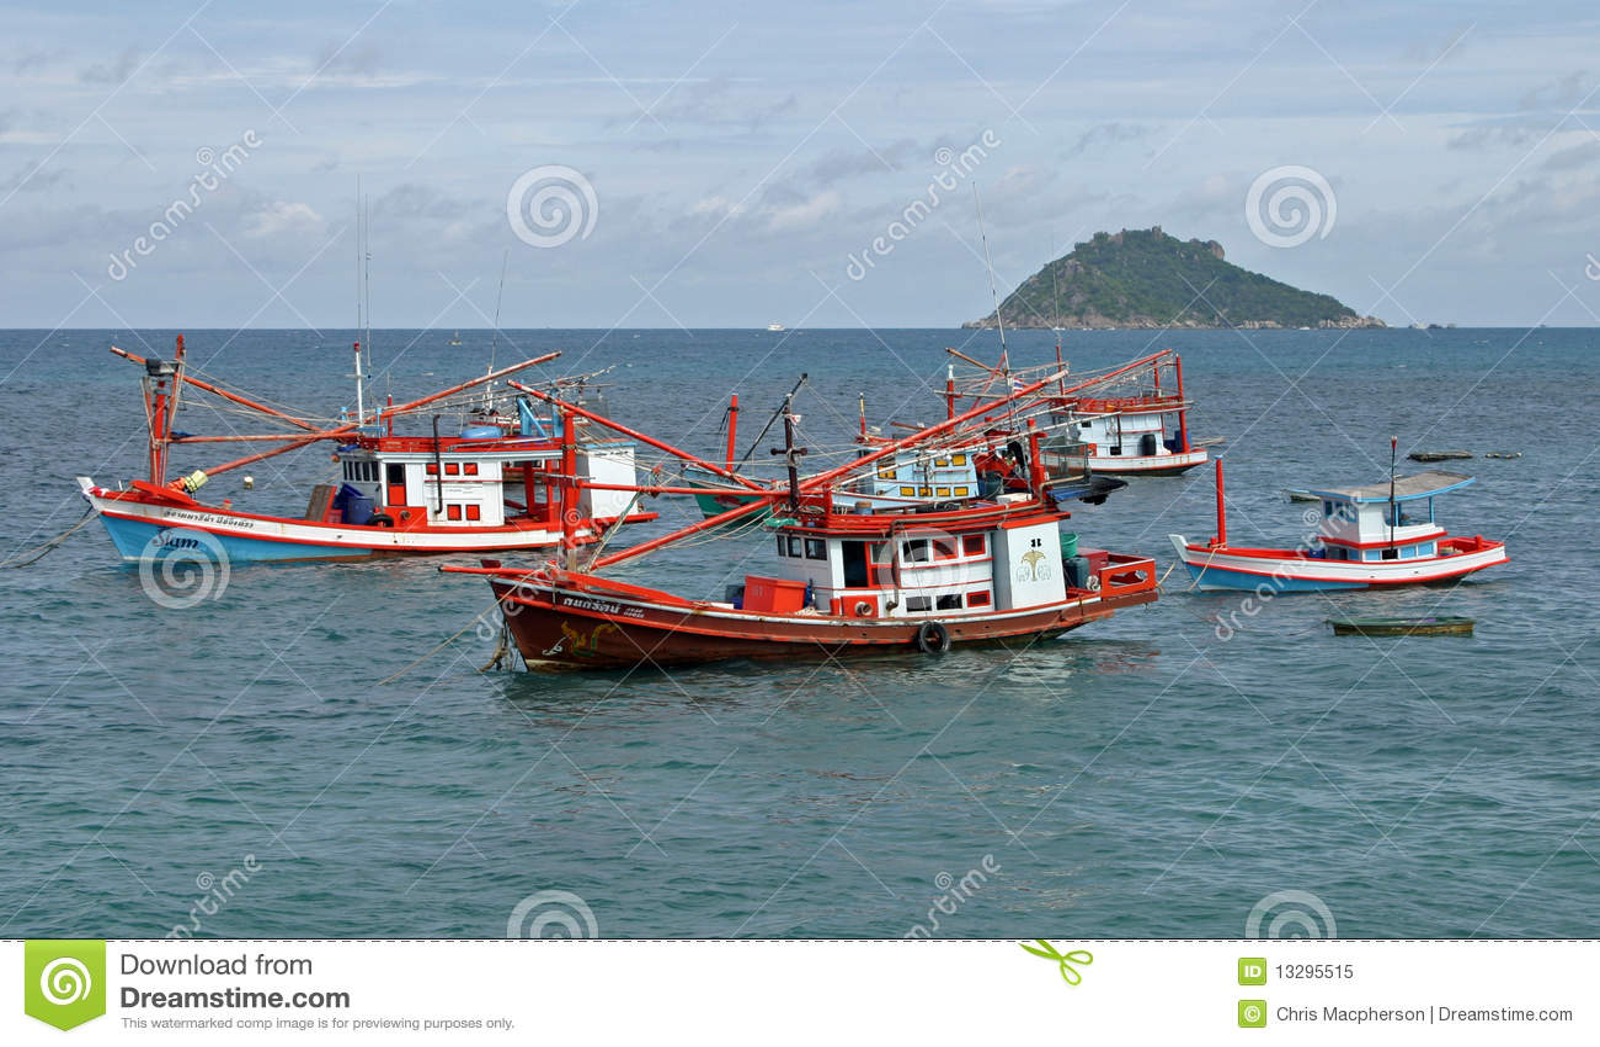 Fishing boats royalty free stock photo image 13295515 for Free fishing boats